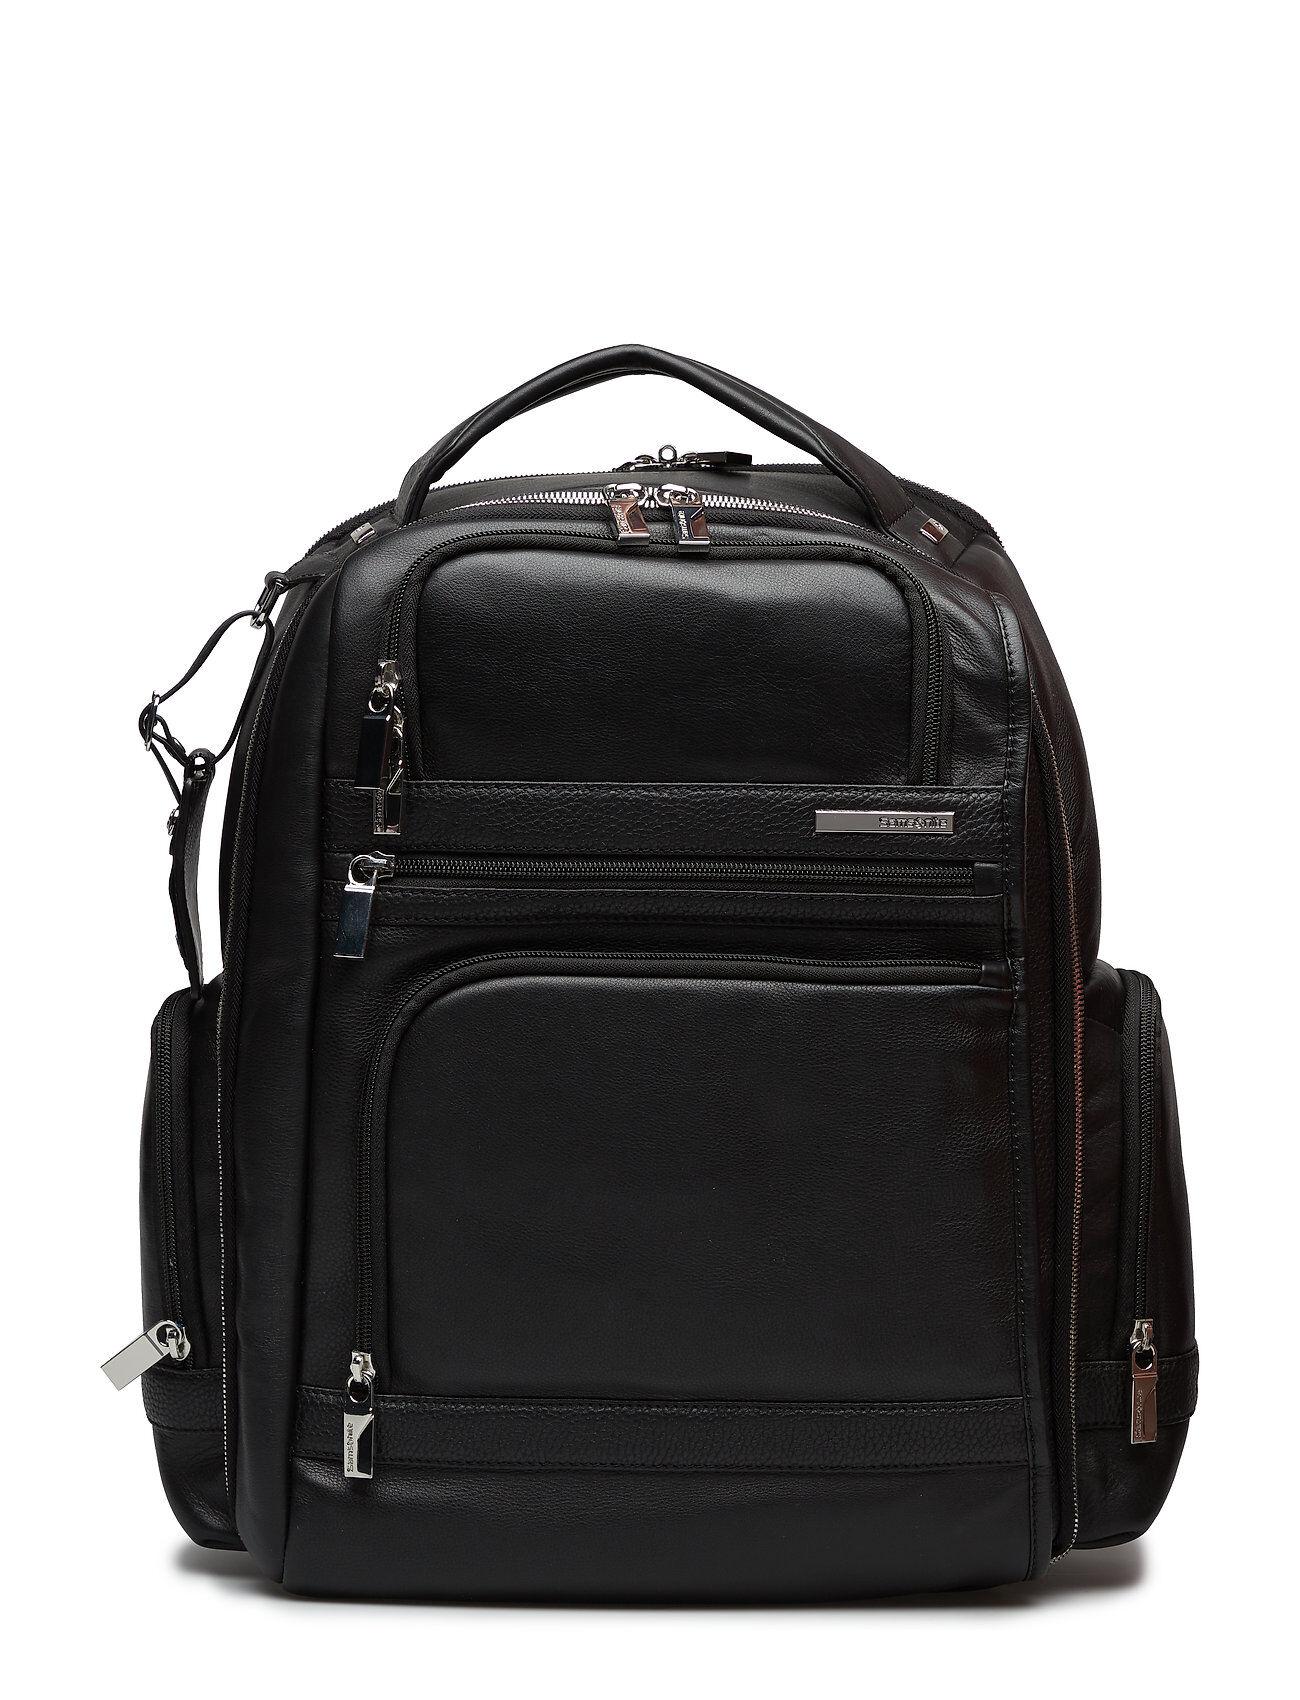 "Samsonite Sunstone Laptop Backpack 15.6"""